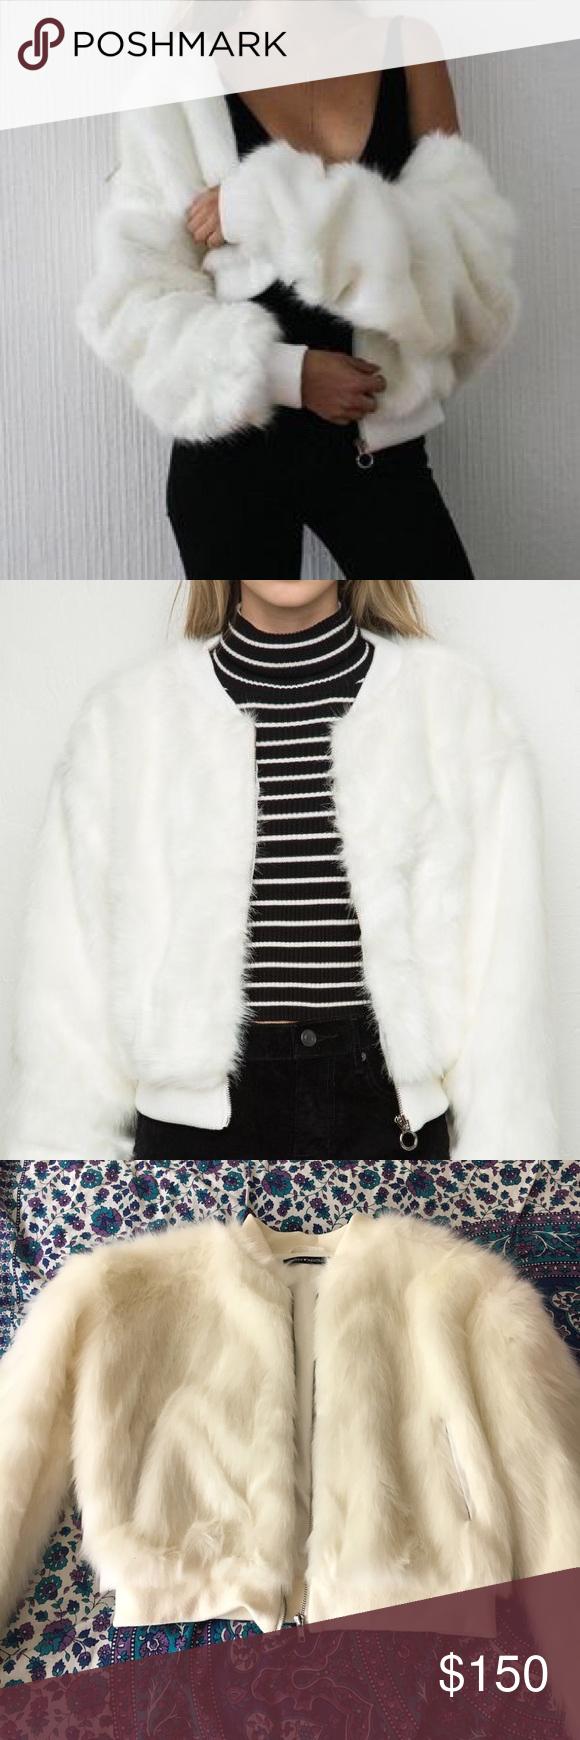 ad3e0eeb8 TAKING OFFERS Brandy Melville fur jacket Brandy Melville white fiona ...